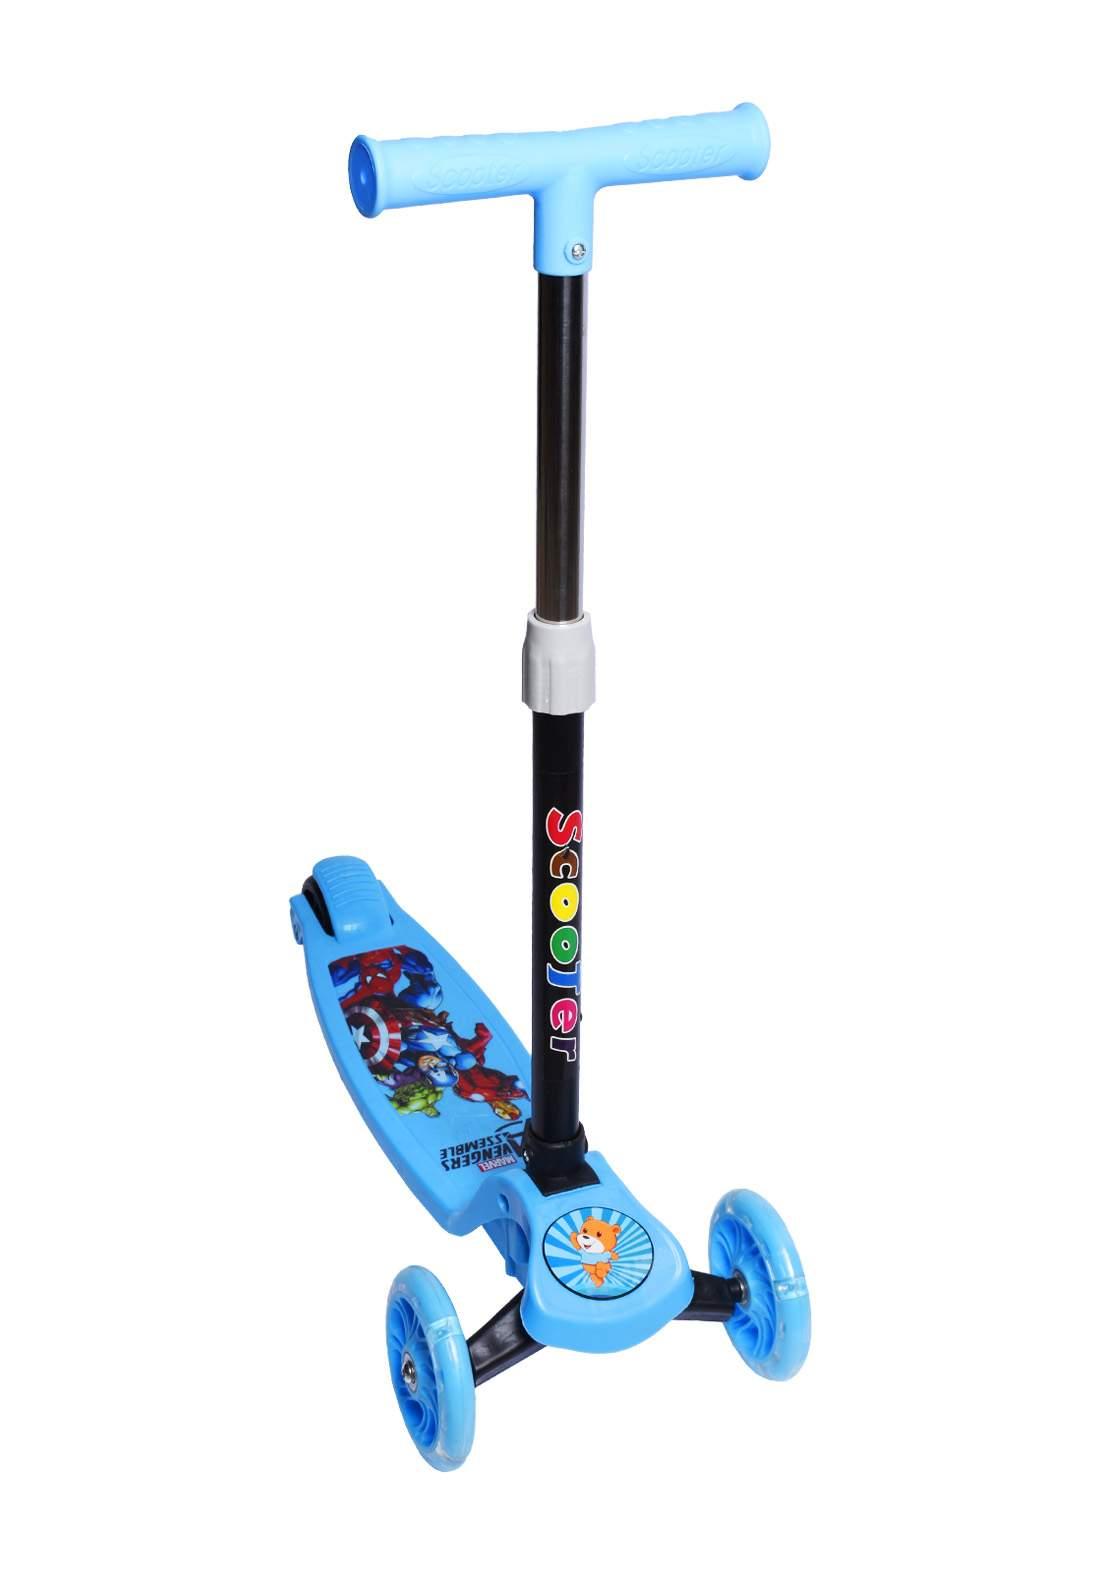 Scooter for kids with 3 wheels سكوتر للاطفال